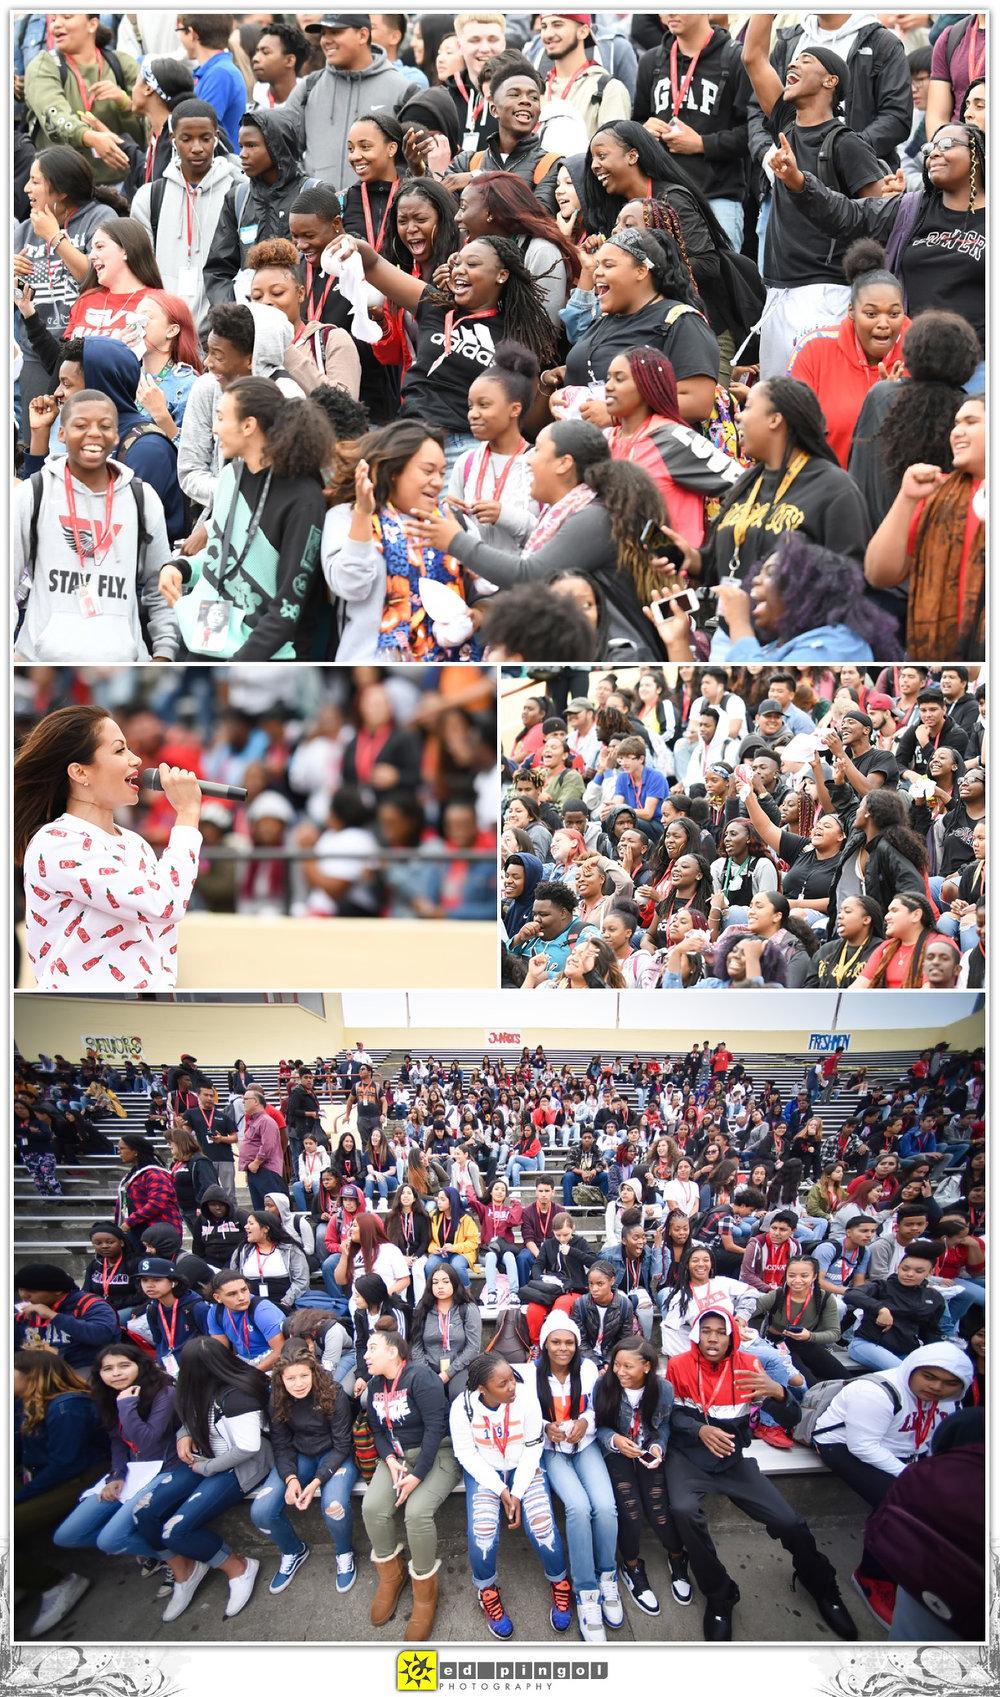 2018.09.06 - PitCCh In at Vallejo High School 005.JPG